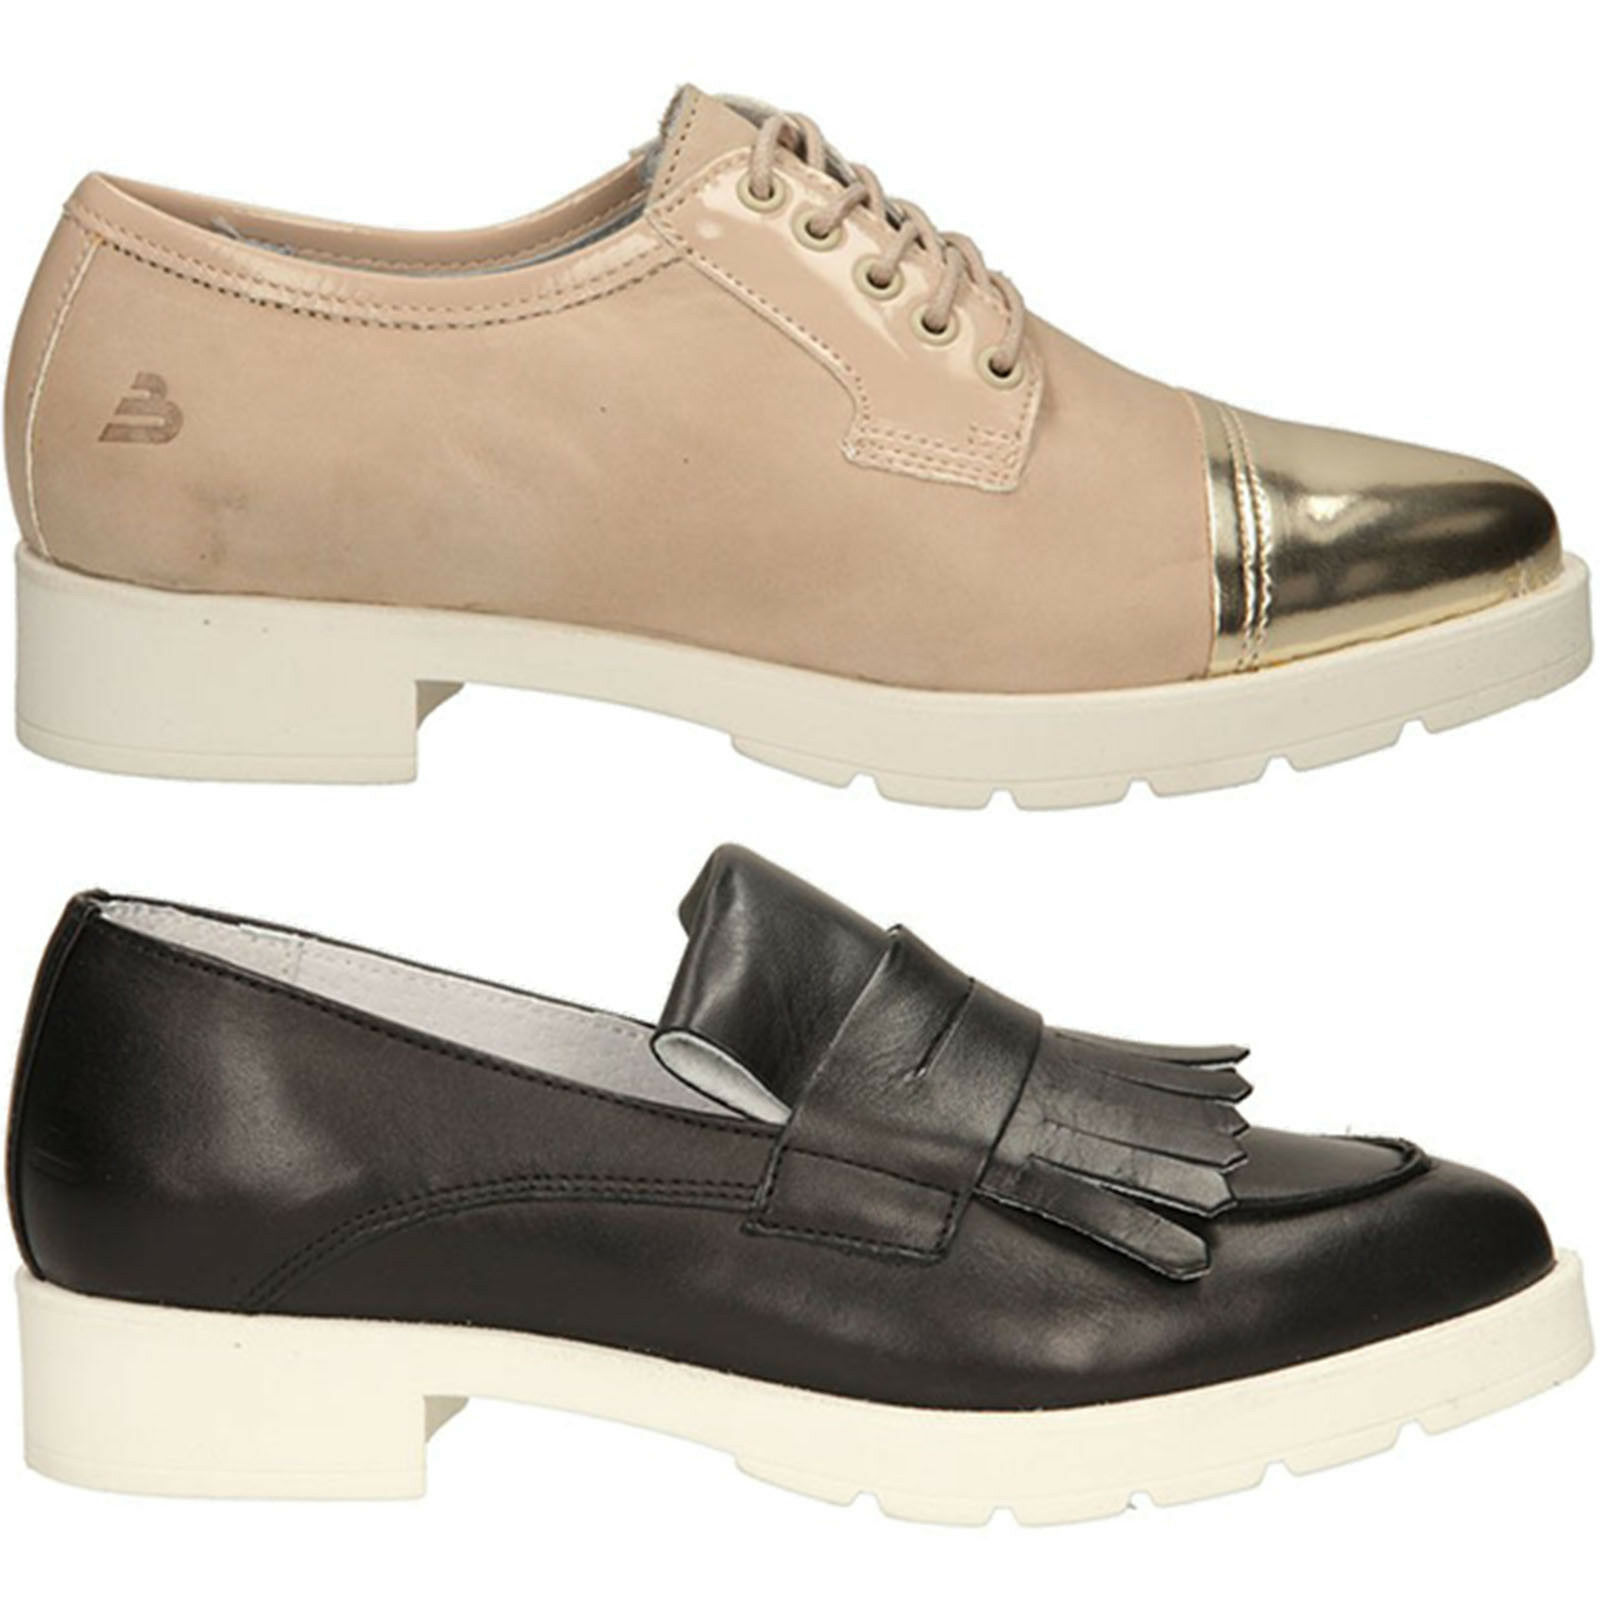 Damen Schuhe Mokassins BullboxerEchtleder Halbschuhe Komfortable Gr. 36-41 NEU